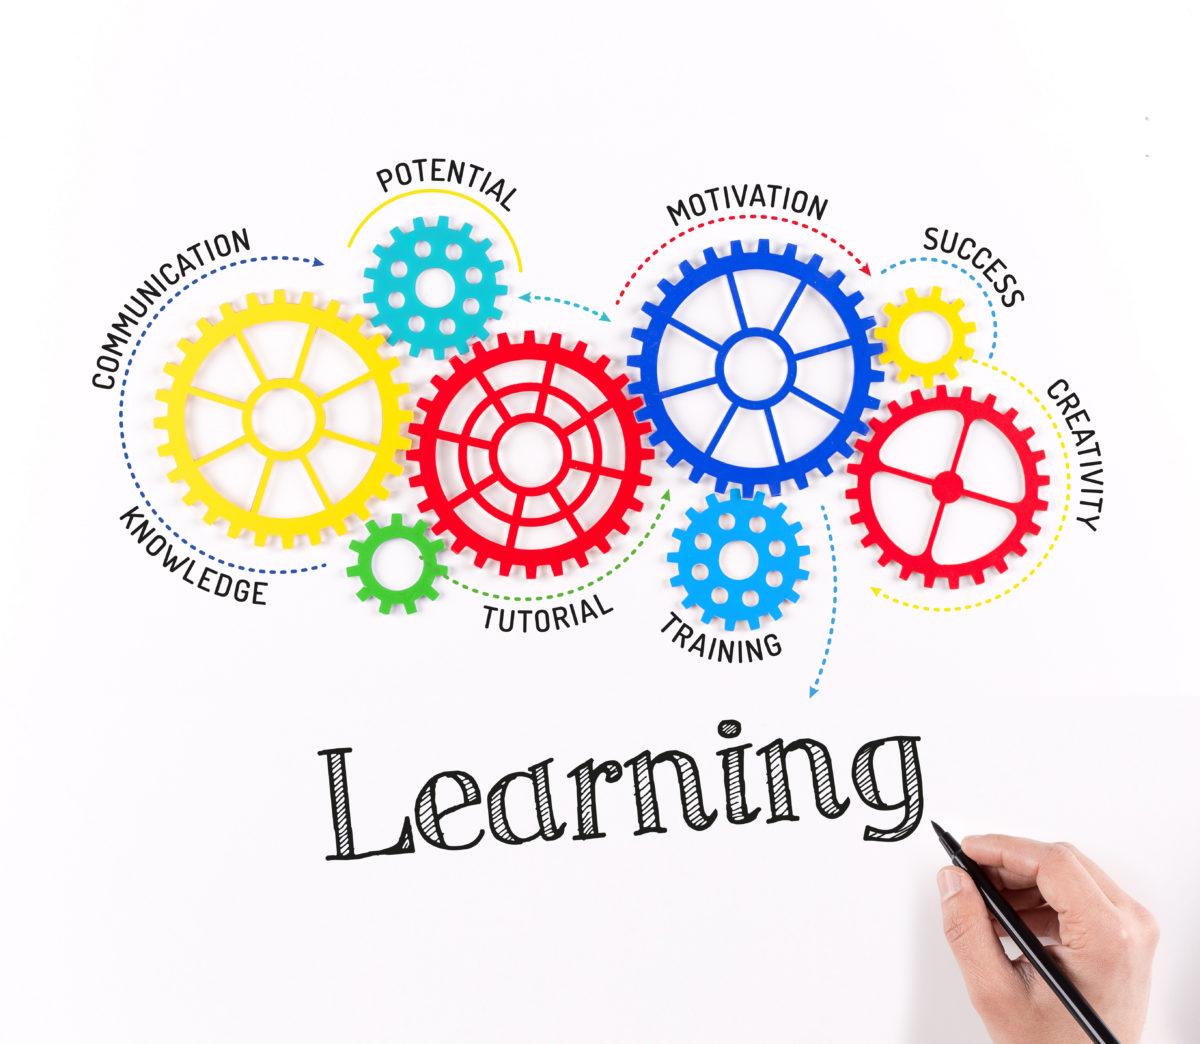 En livslang læringsprosess